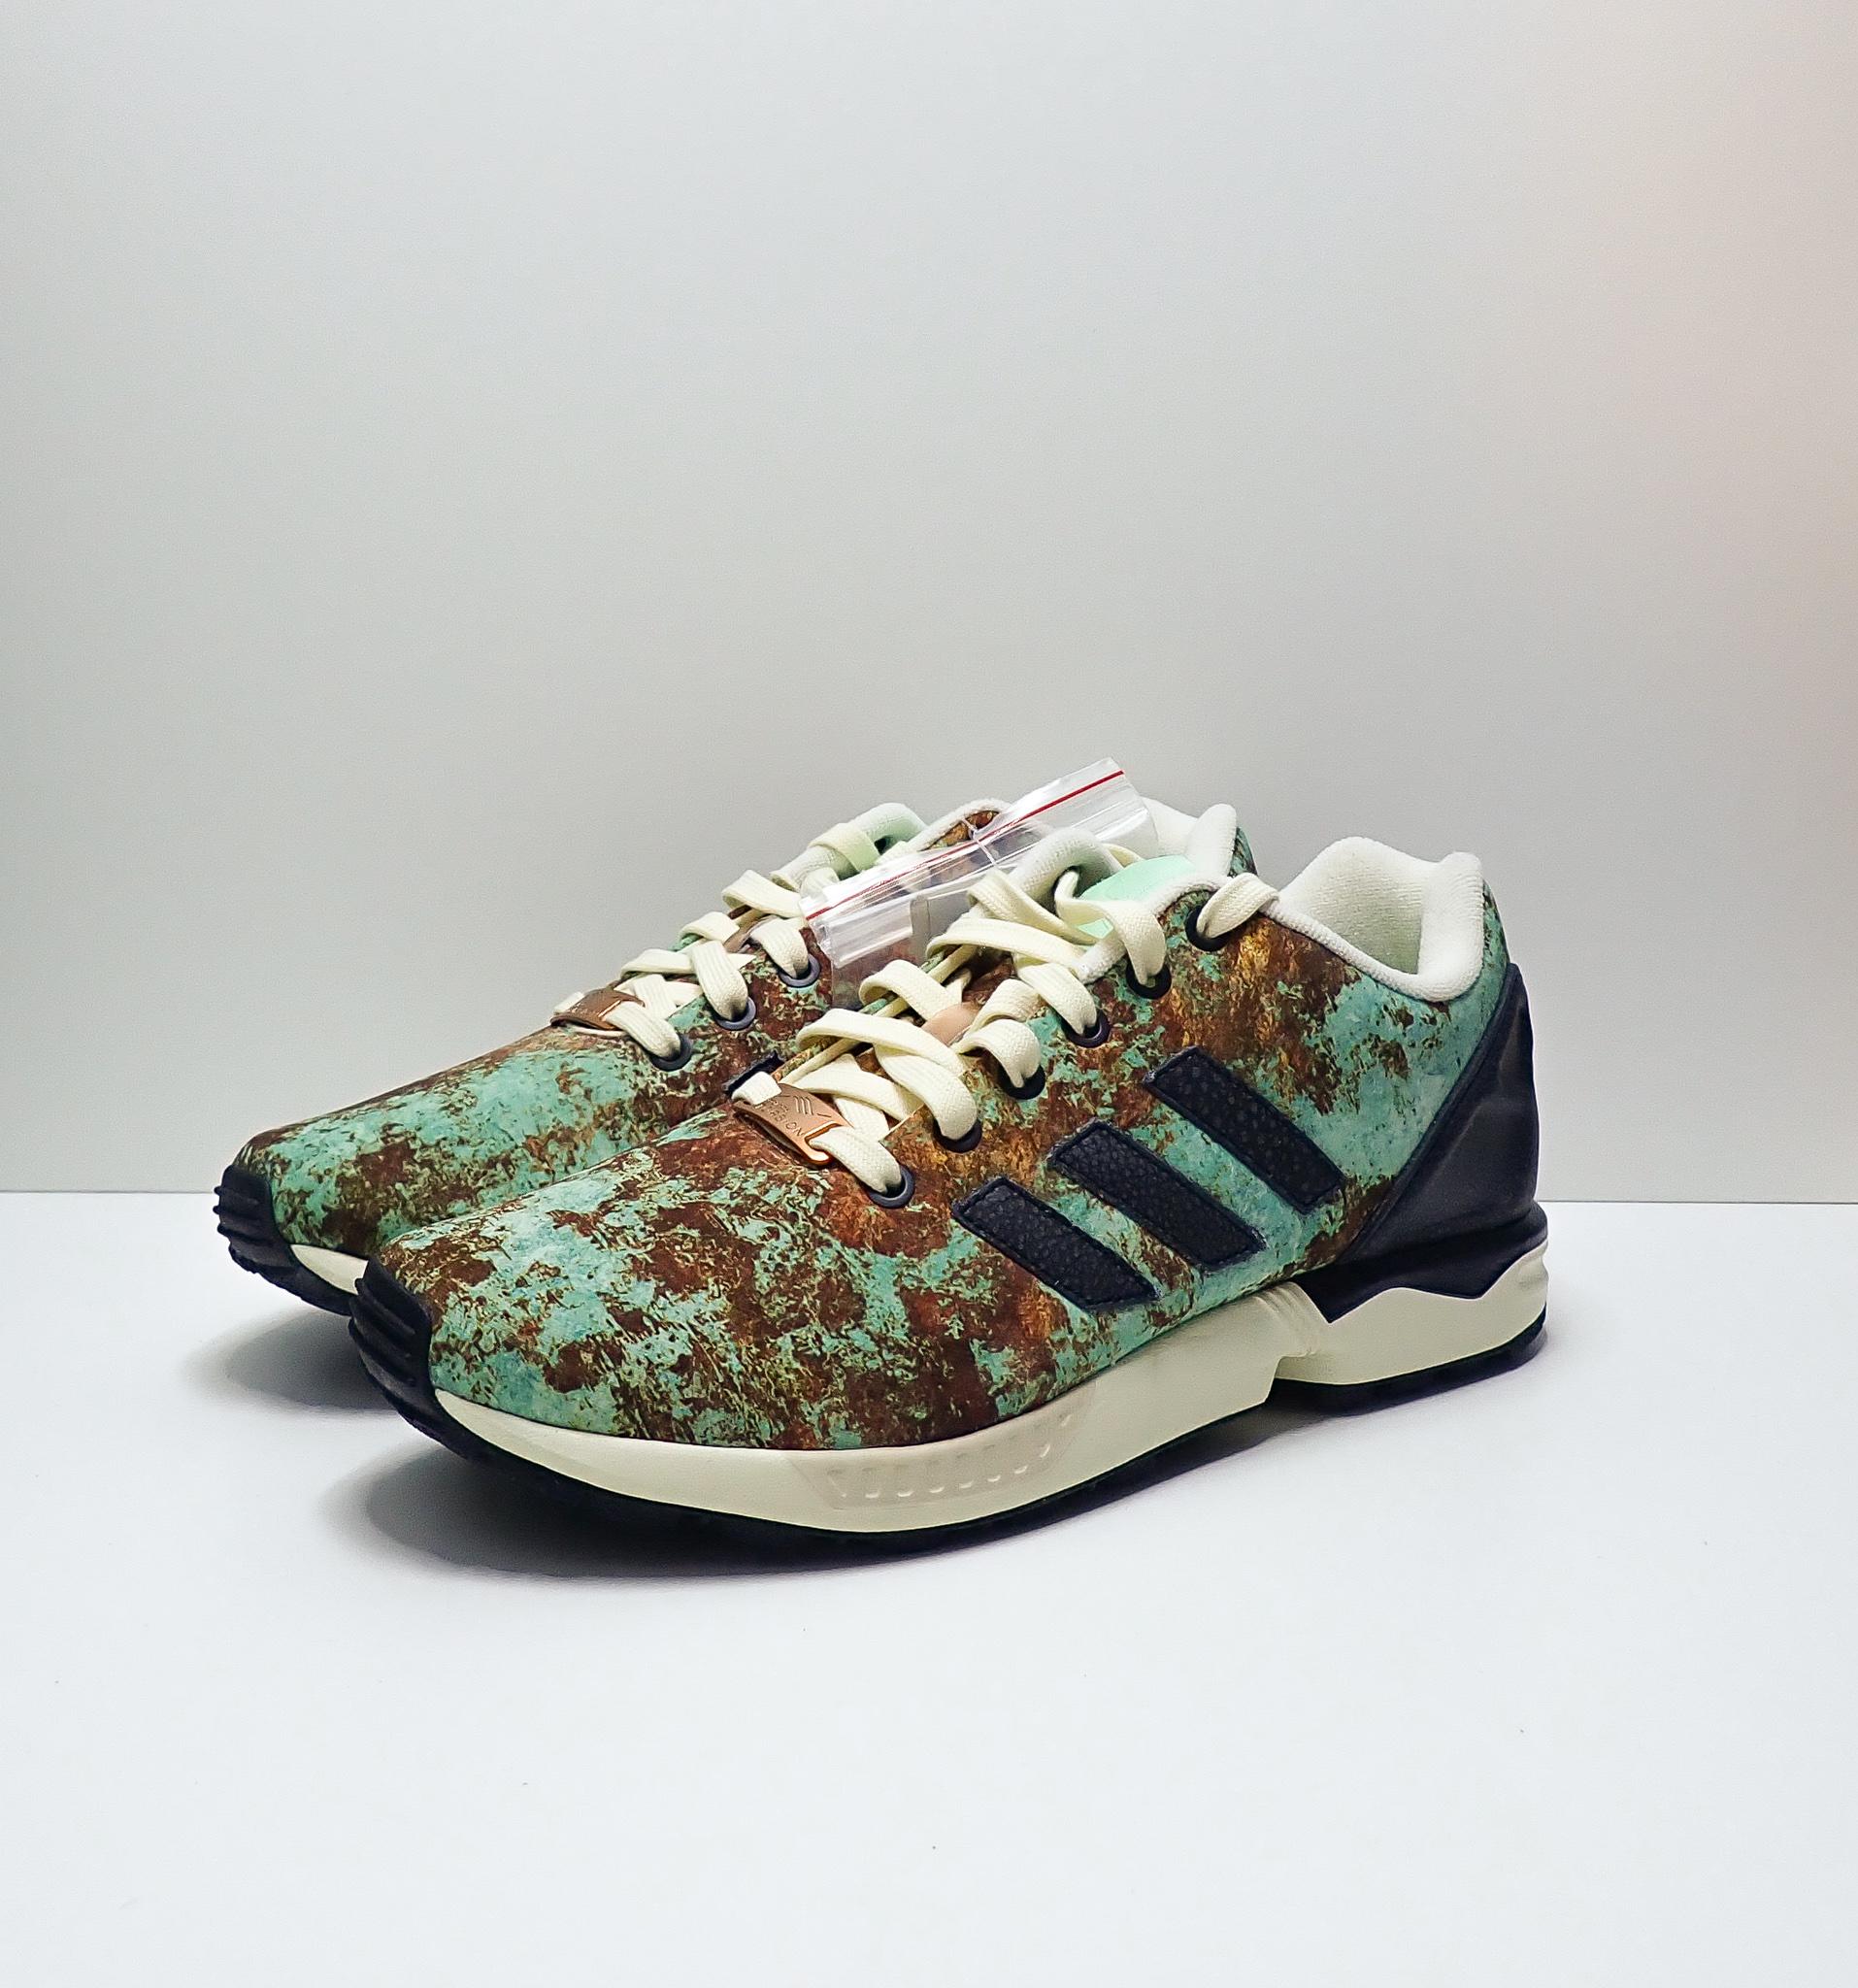 Adidas Sneakersnstuff x Originals ZX Flux Aged Copper